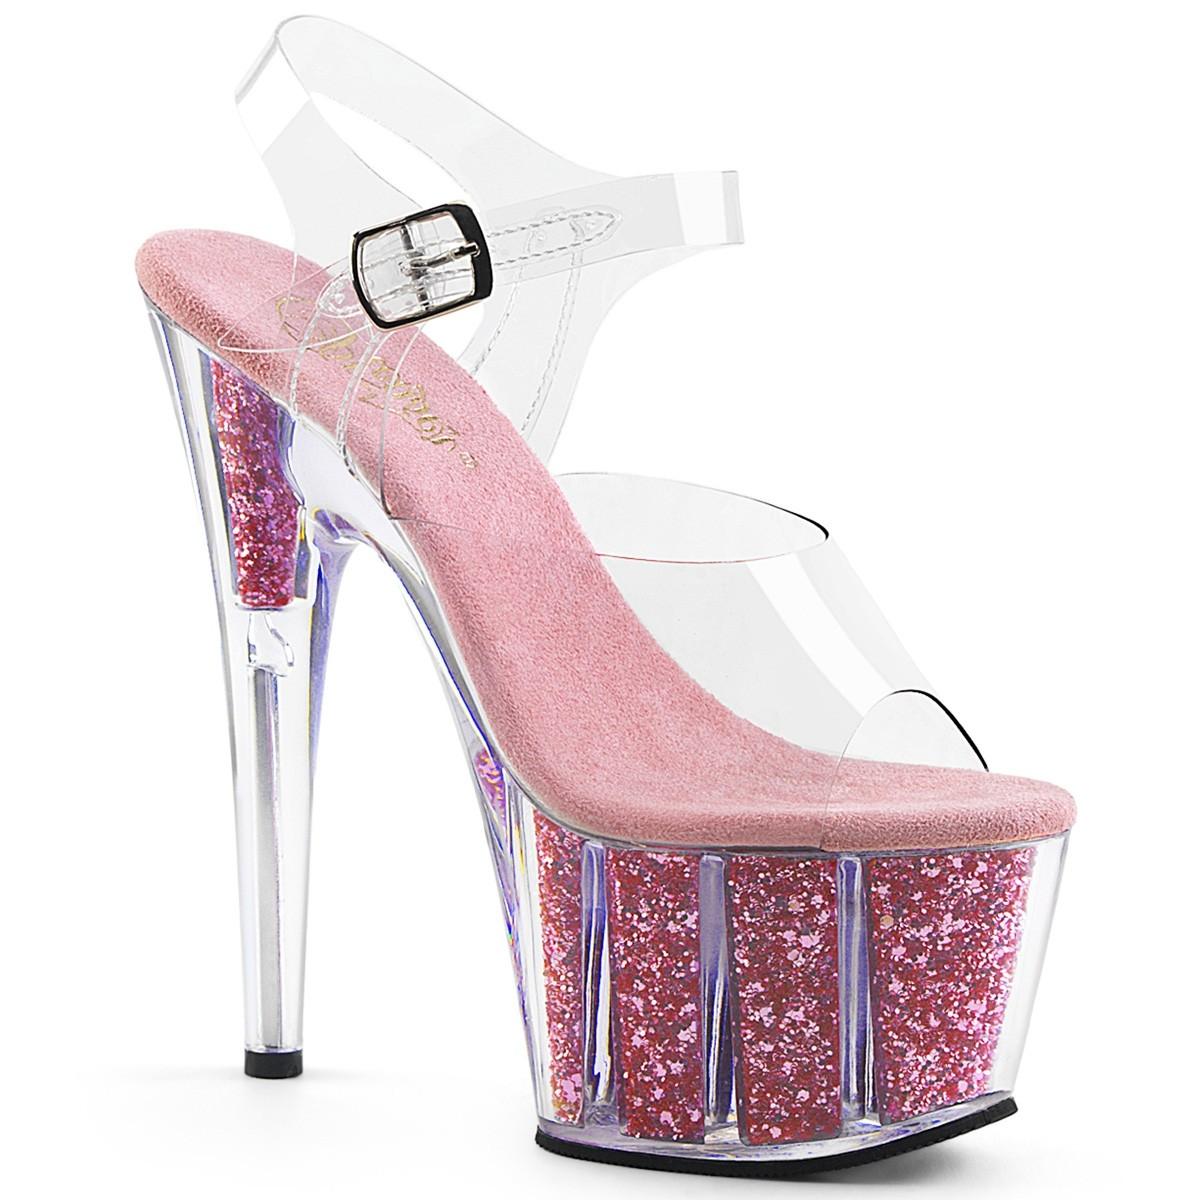 Adore 708G  Clr / B.Pink Glitter Inserts